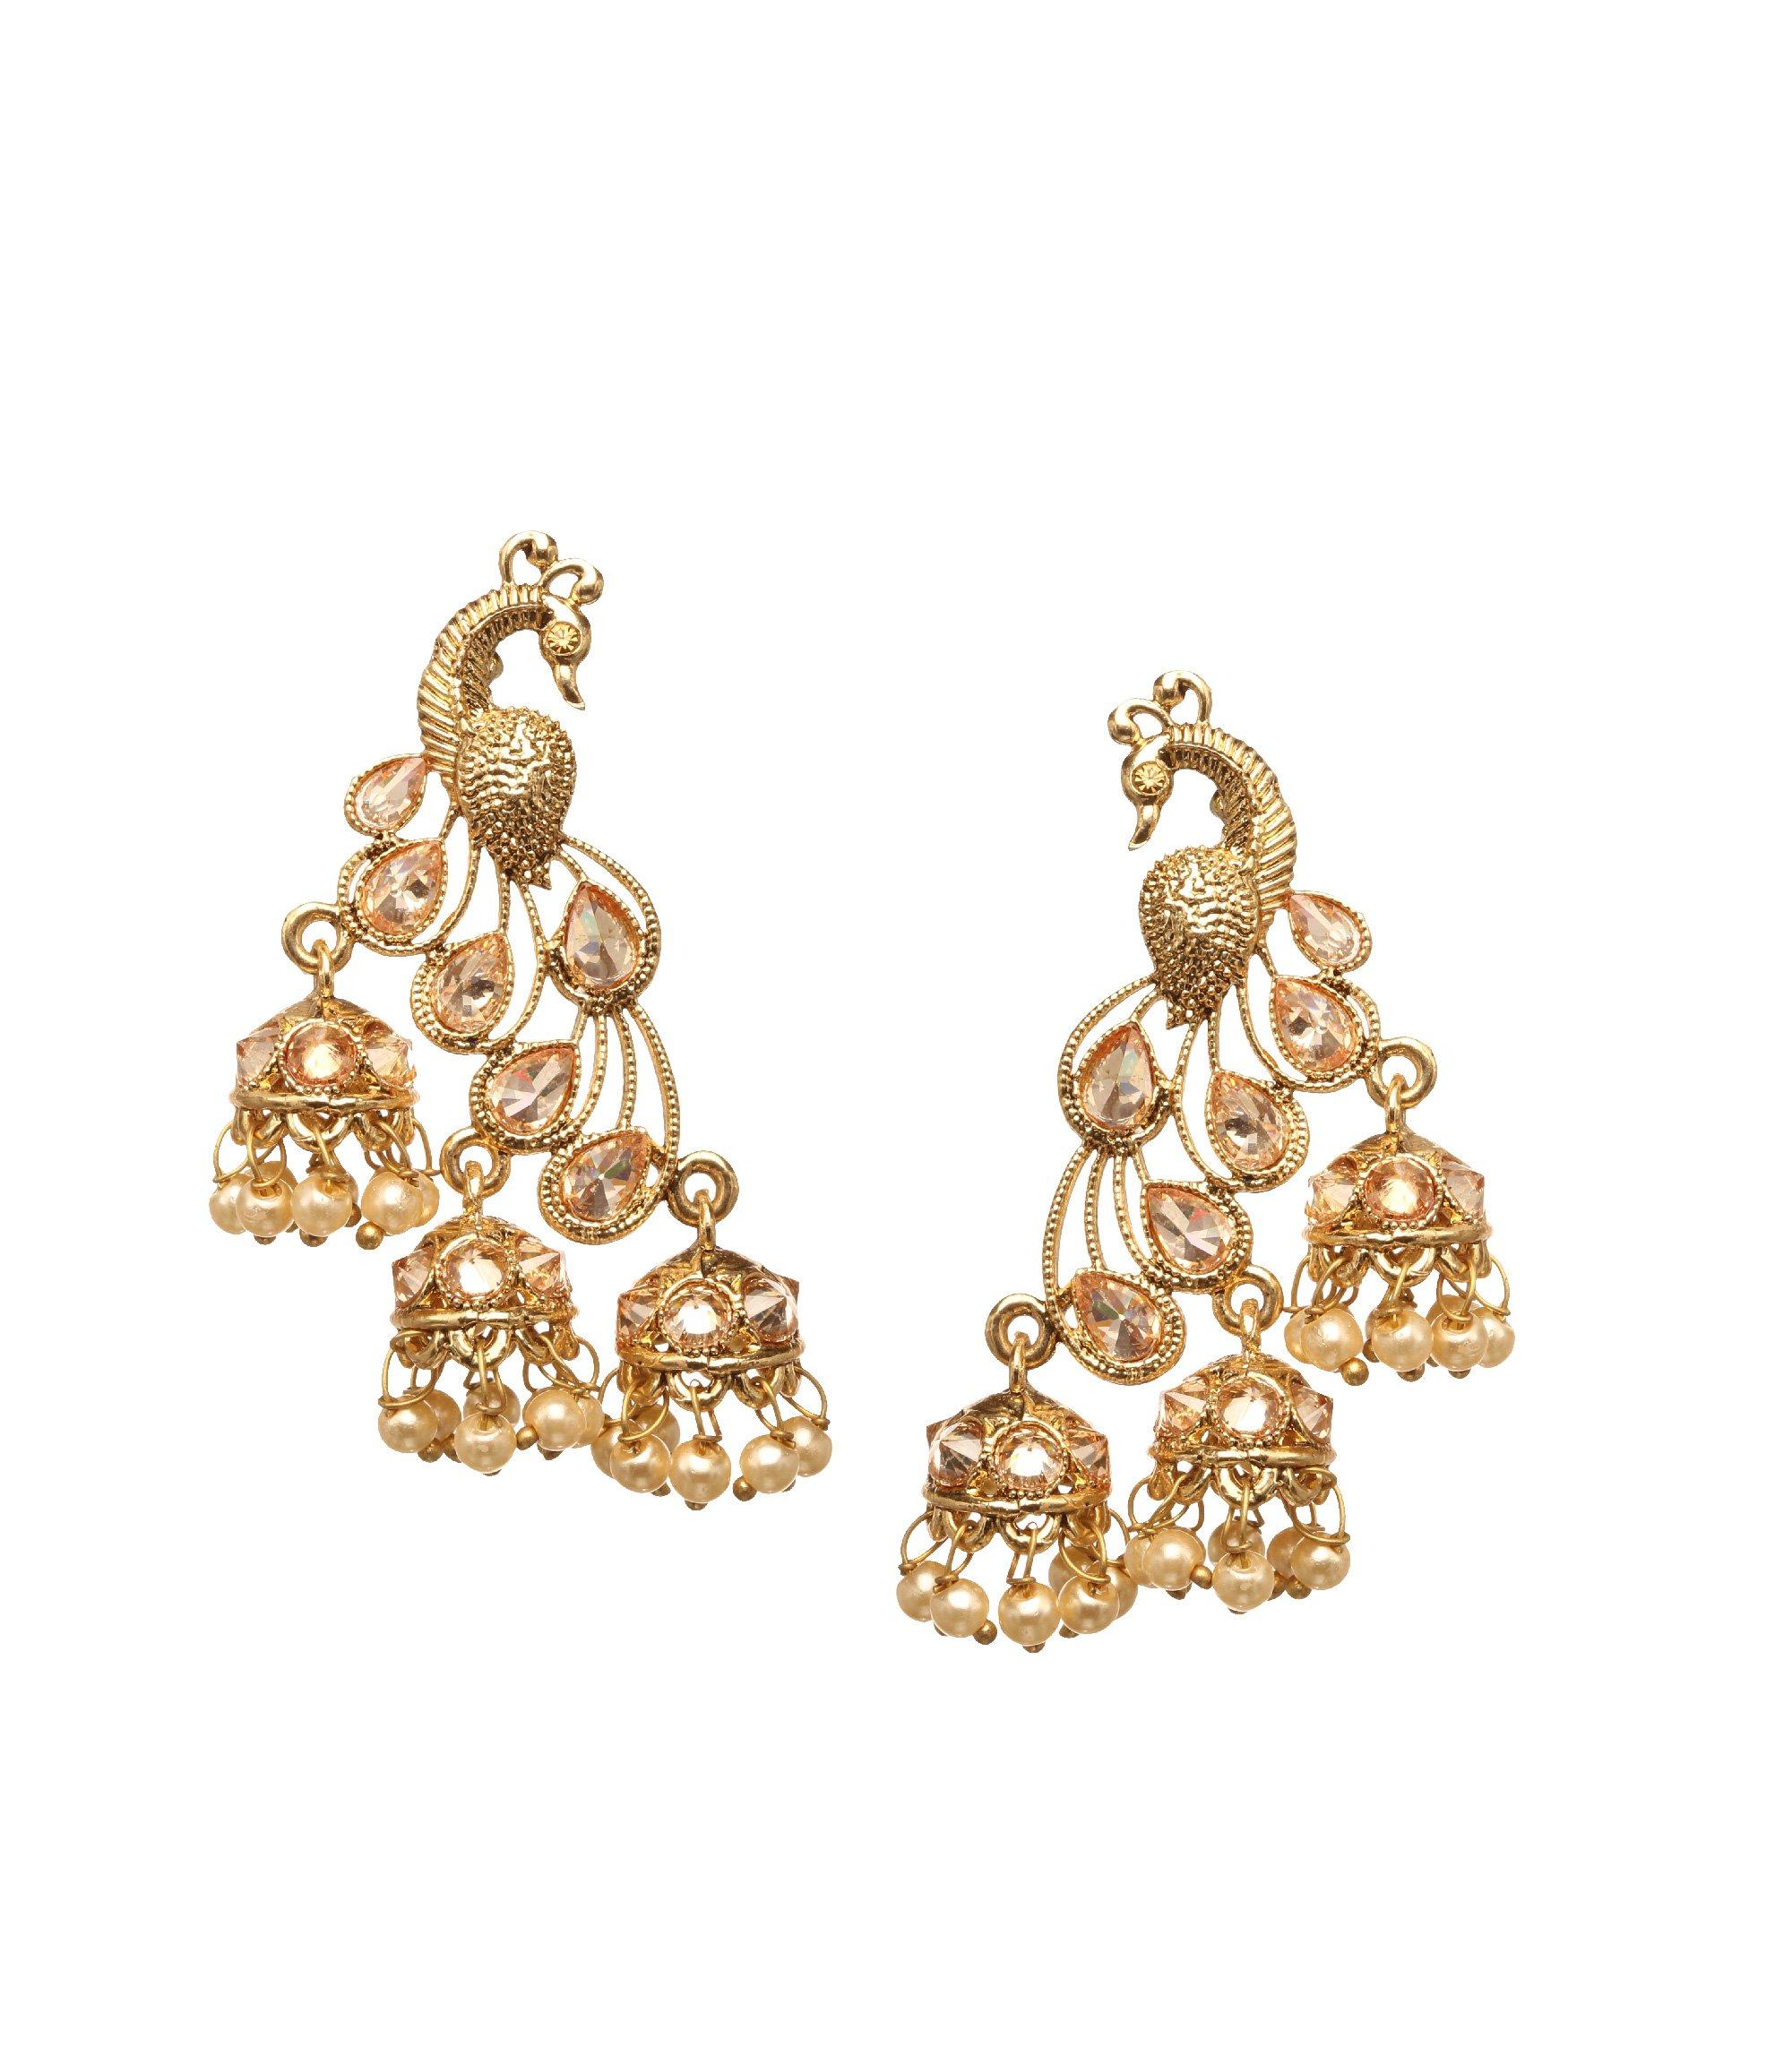 Bindhani Premium Quality Indian Jewelry Wedding Bahubali Style Bollywood Peacock Jhumki Jhumka Earrings For Women